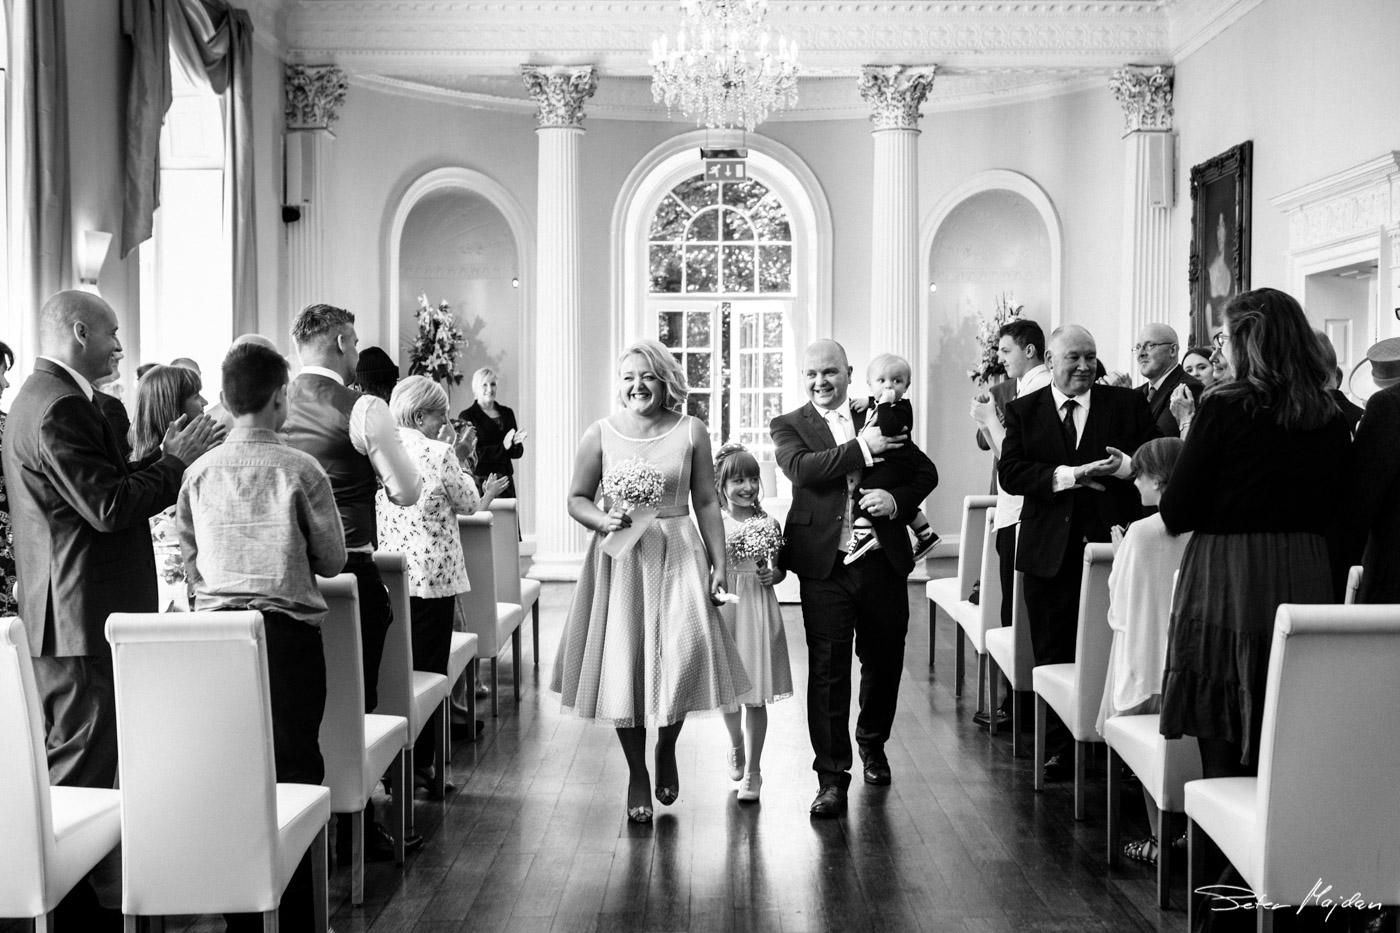 Colwick-hall-wedding-photography-25.jpg